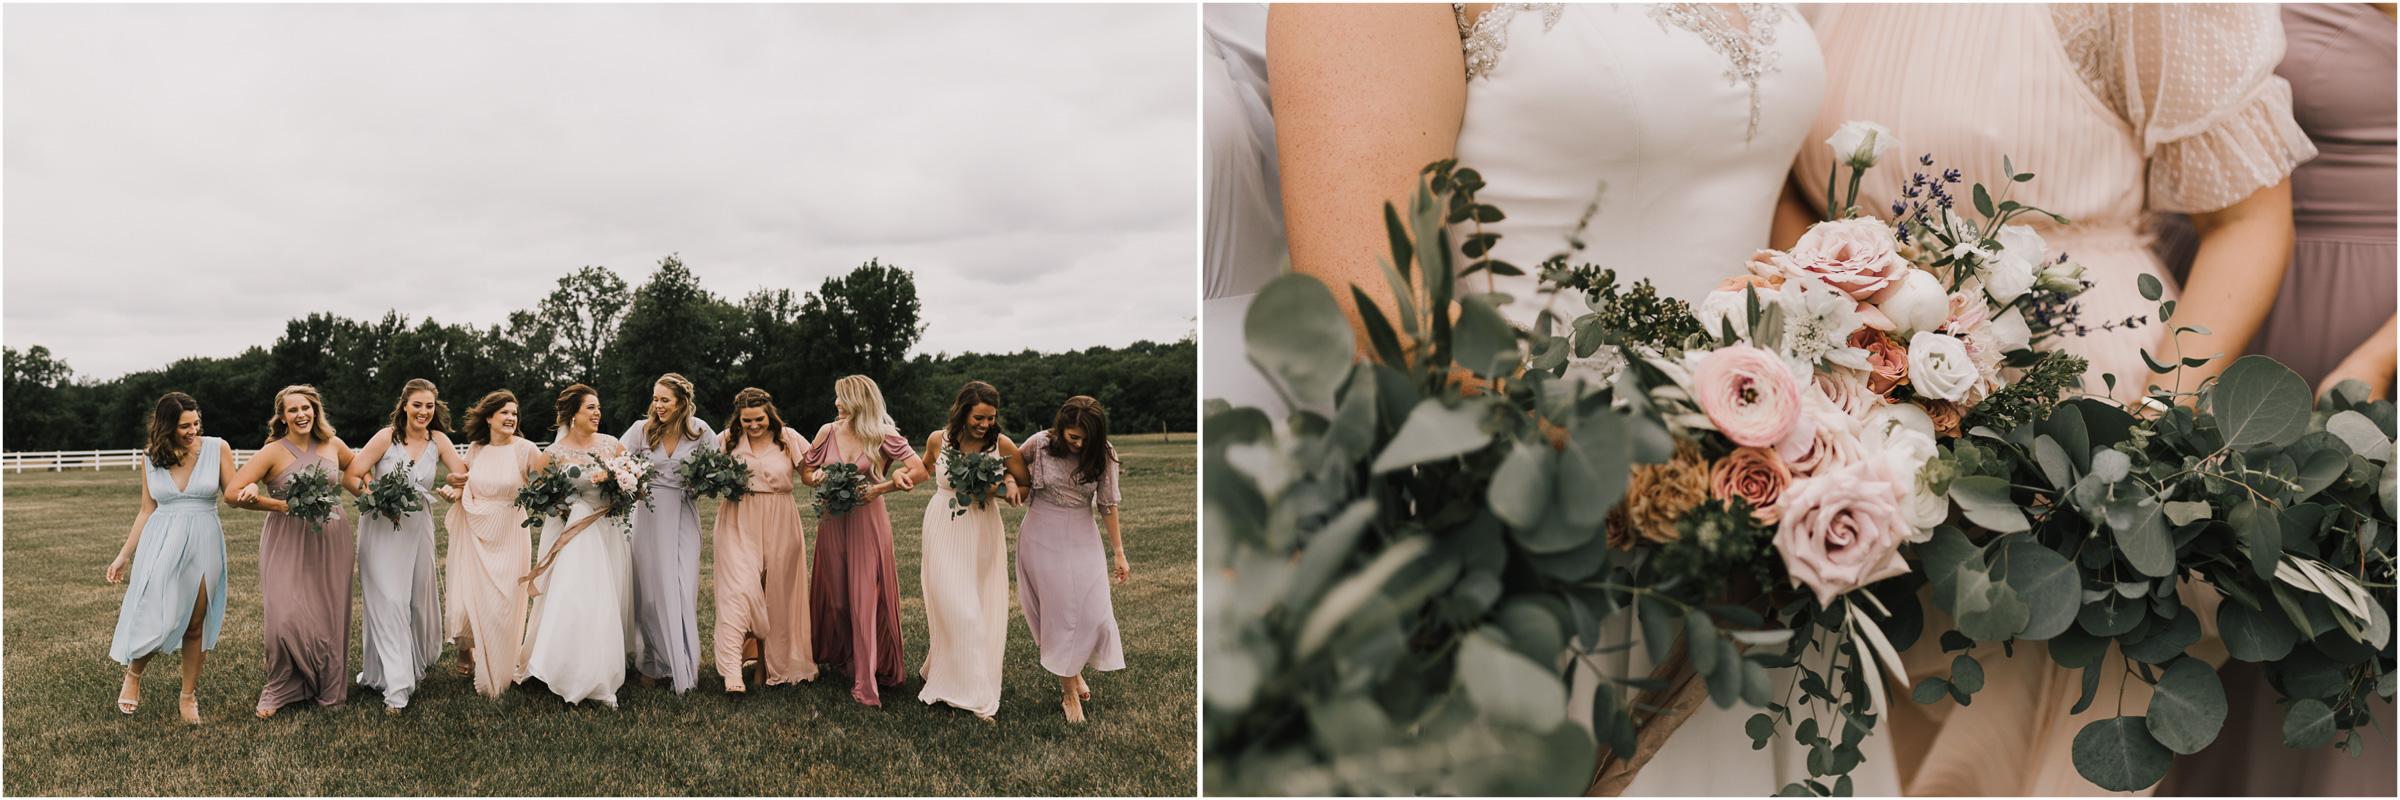 alyssa barletter photography summer odessa missouri wedding kansas city photographer-26.jpg